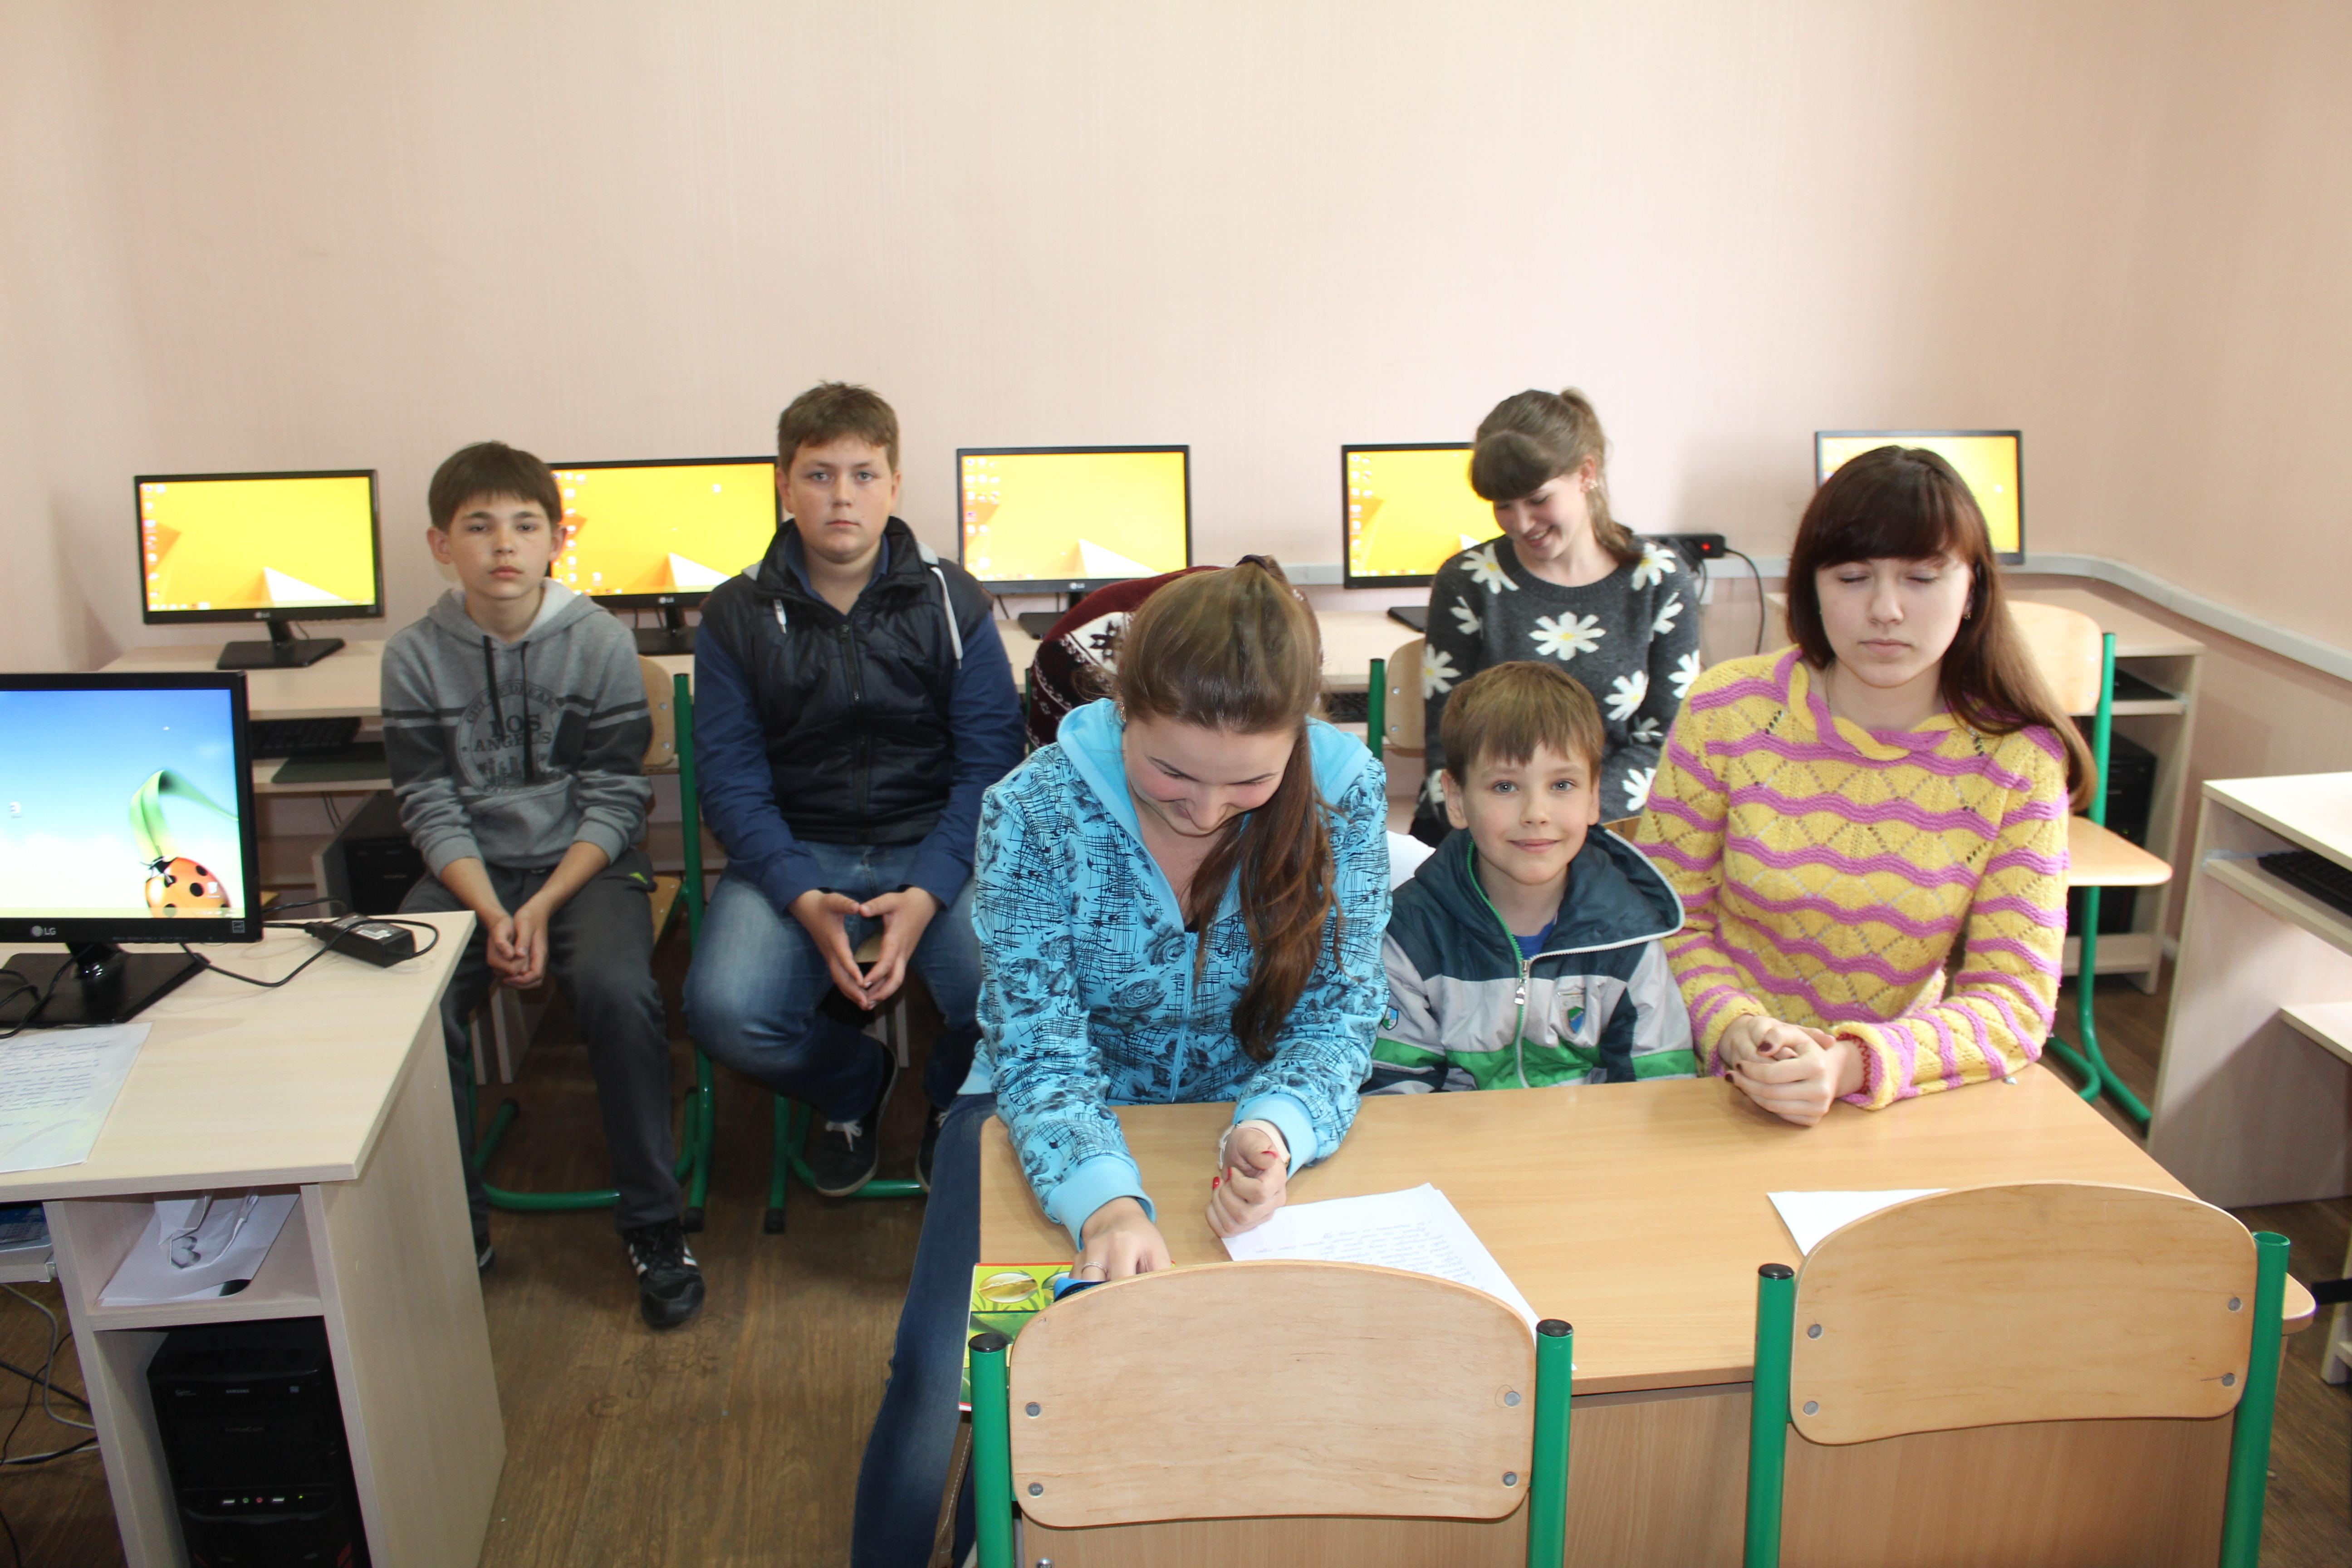 Students of Shchastya school thanking Lituania for their new school 26.04.2016 Luc Maffre